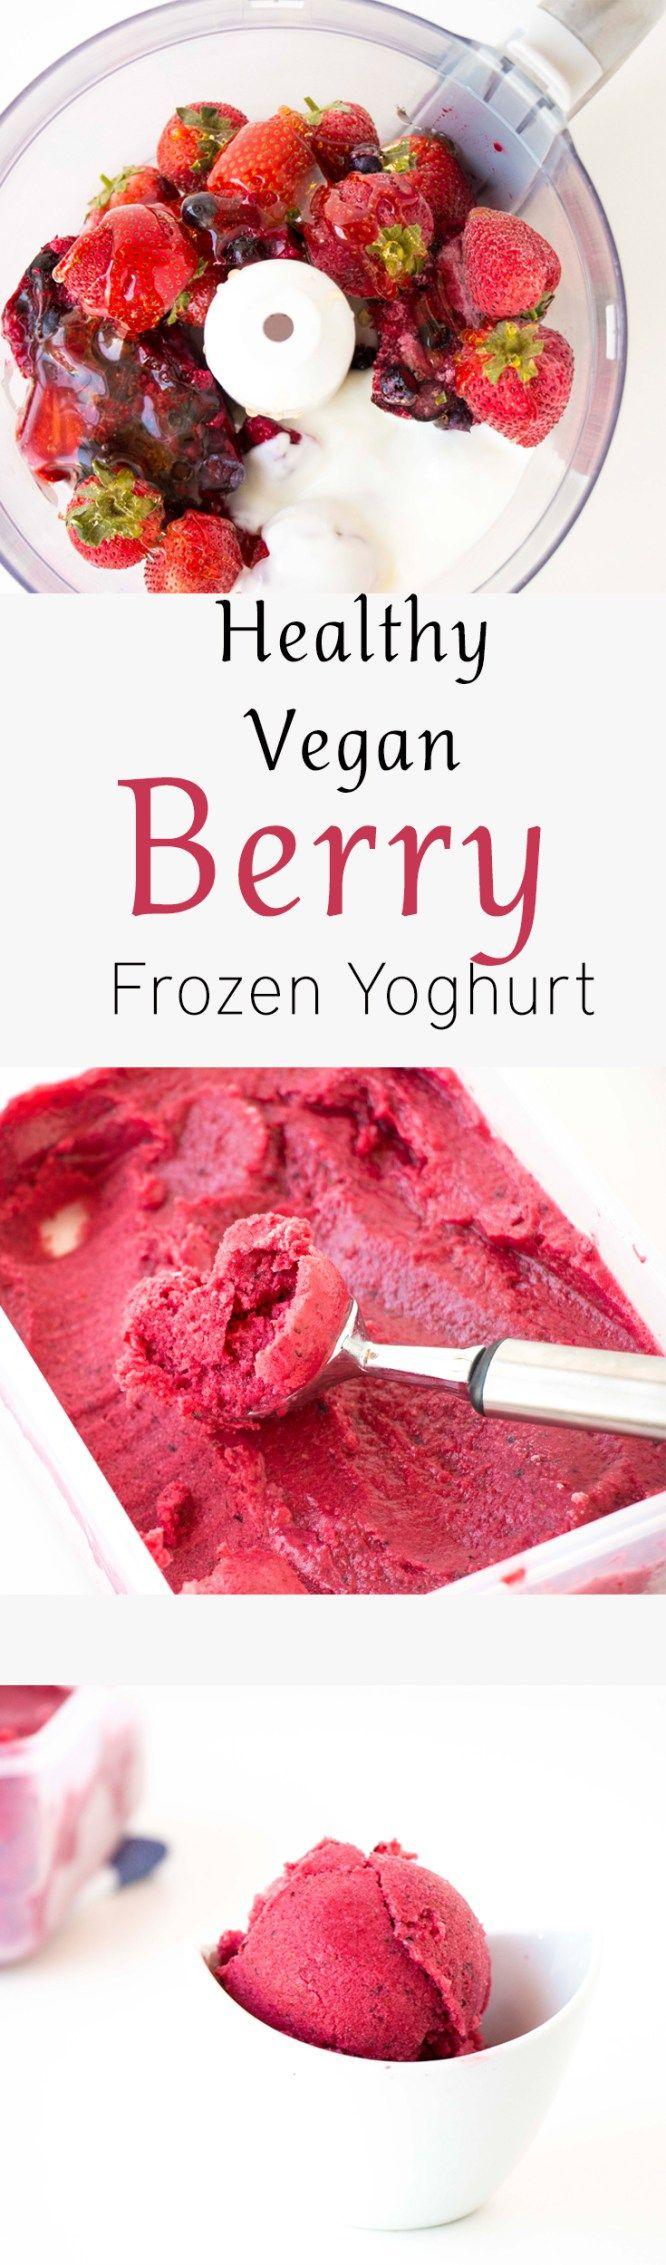 Healthy Vegan Berry Frozen Yoghurt - Baking-Ginger Read more in http://natureandhealth.net/